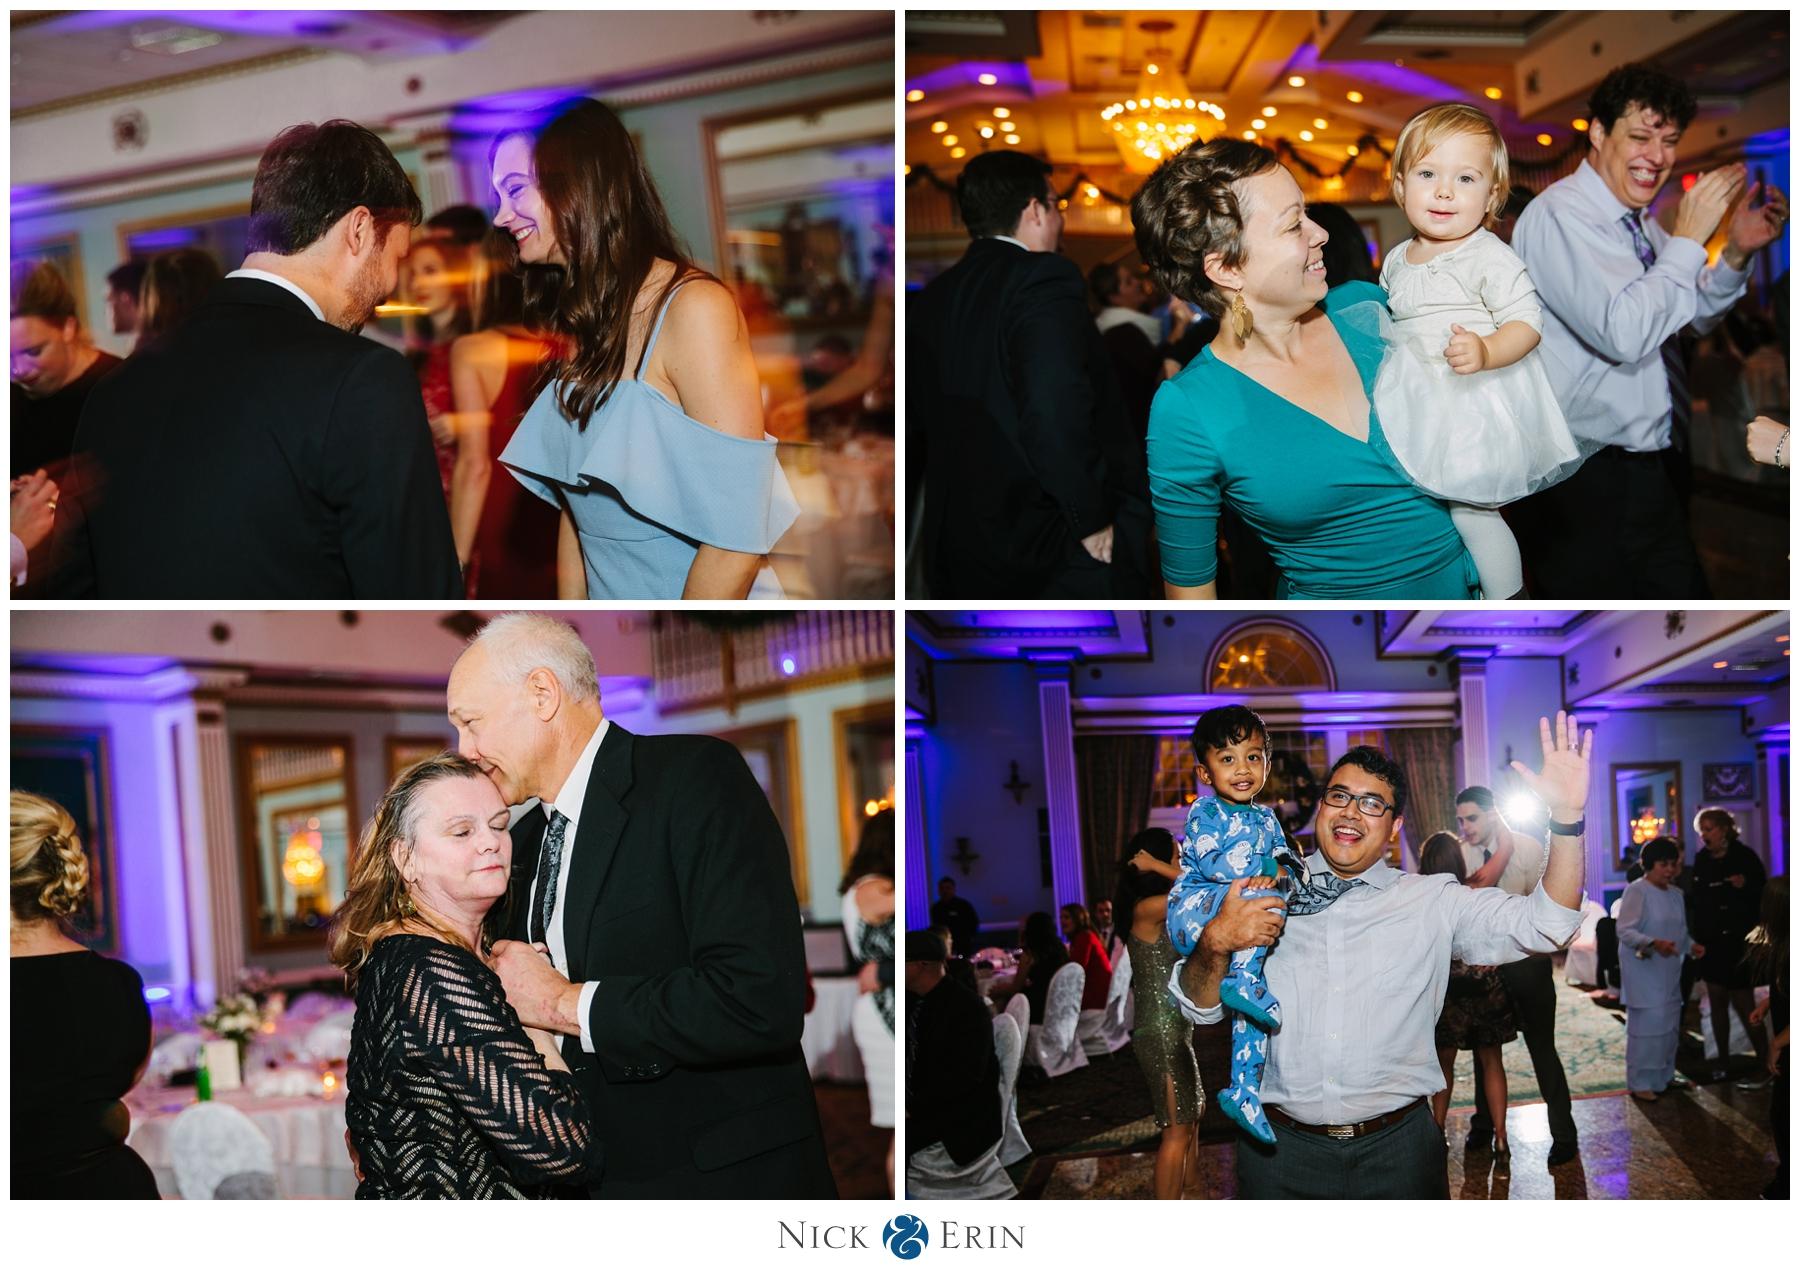 Donner_Photography_Mendenhall Inn Wedding_Blake & Kristina_0046